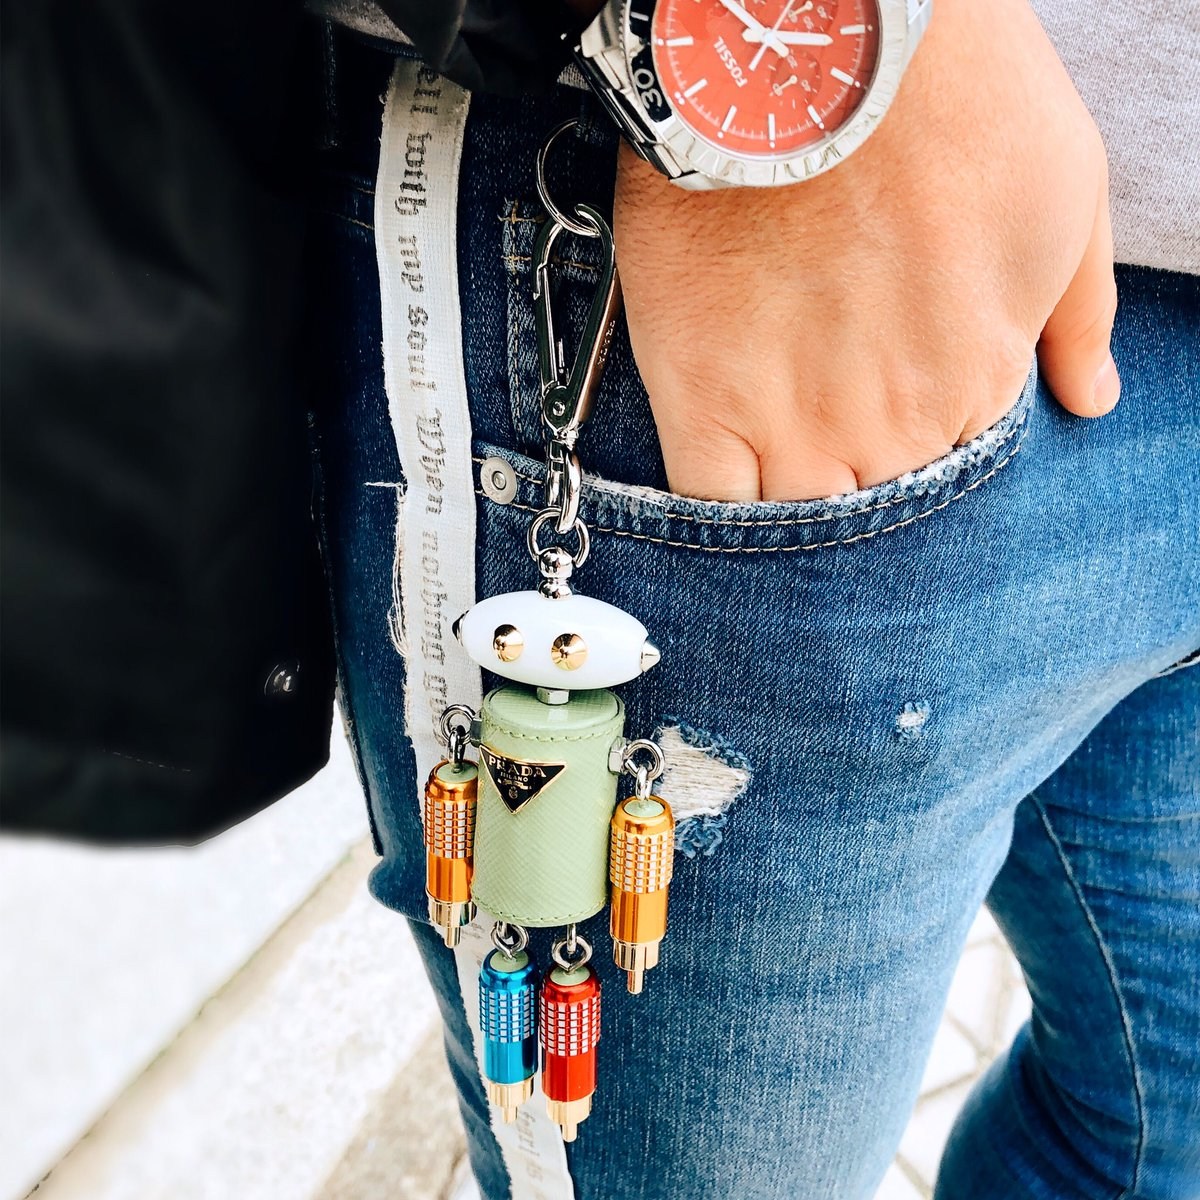 [PRADA] or NADA🤖  _______________________ #prada #pradakeyring #keyring #keyrings #georgesplaces #bracelet #pretty #love #beautiful #trendy #fashion #fashionista #accessories #pradavintage #lifestyle #mensfashion #lifeisgood #stylemen #styleinspiration 🟢🟩